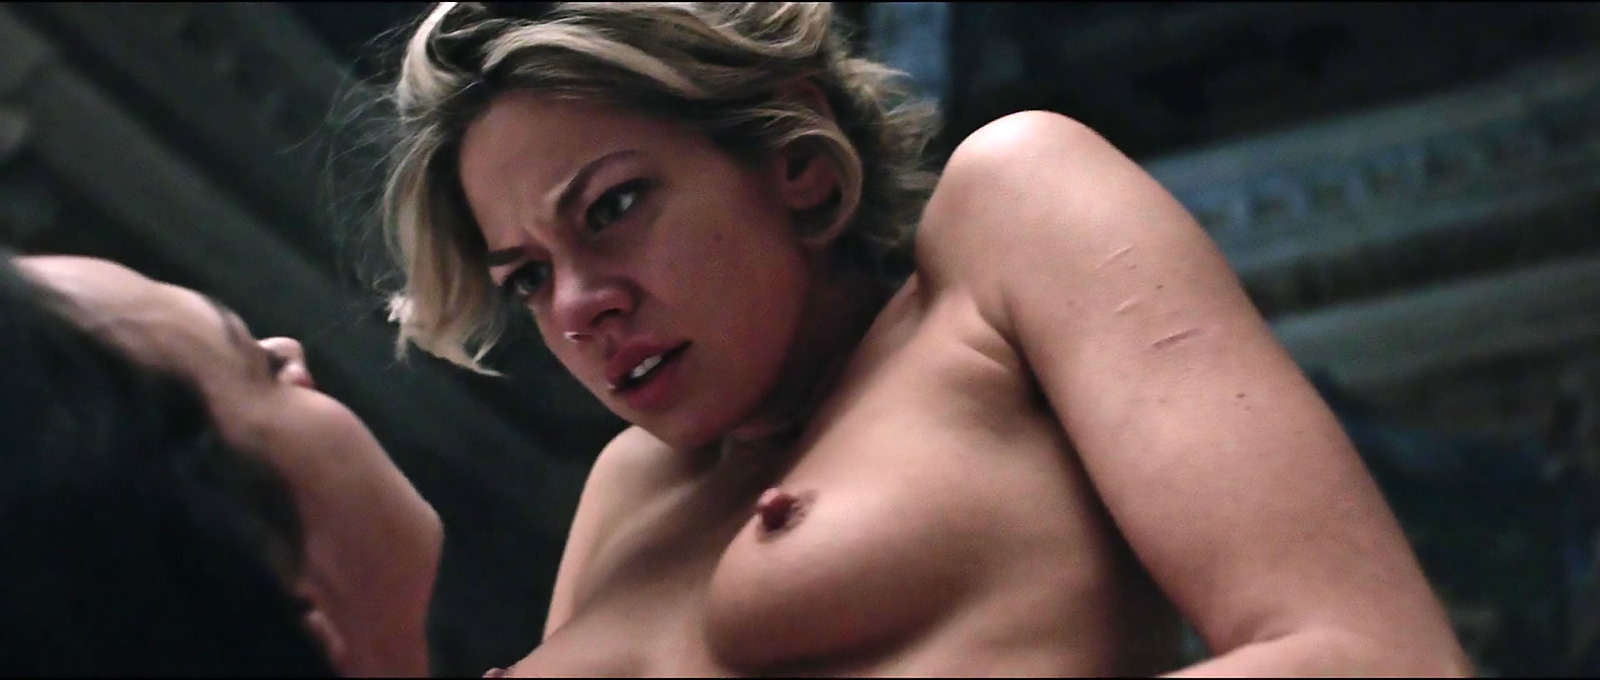 Eva marie sex video hot porn abuse